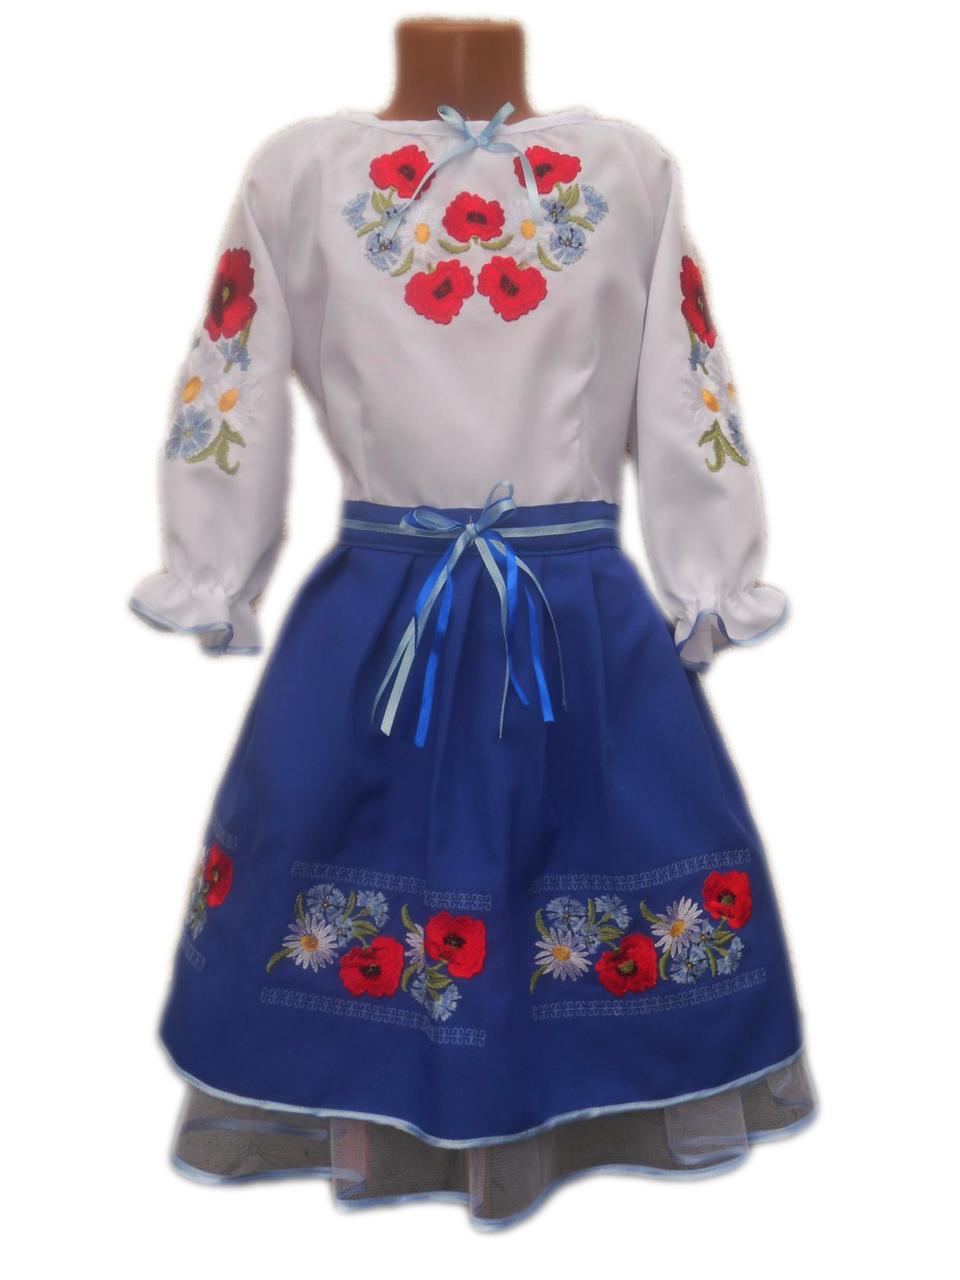 "Вишите плаття для дівчинки ""Лейла"" (Вышитое платье для девочки ""Лейла"") DN-0038"